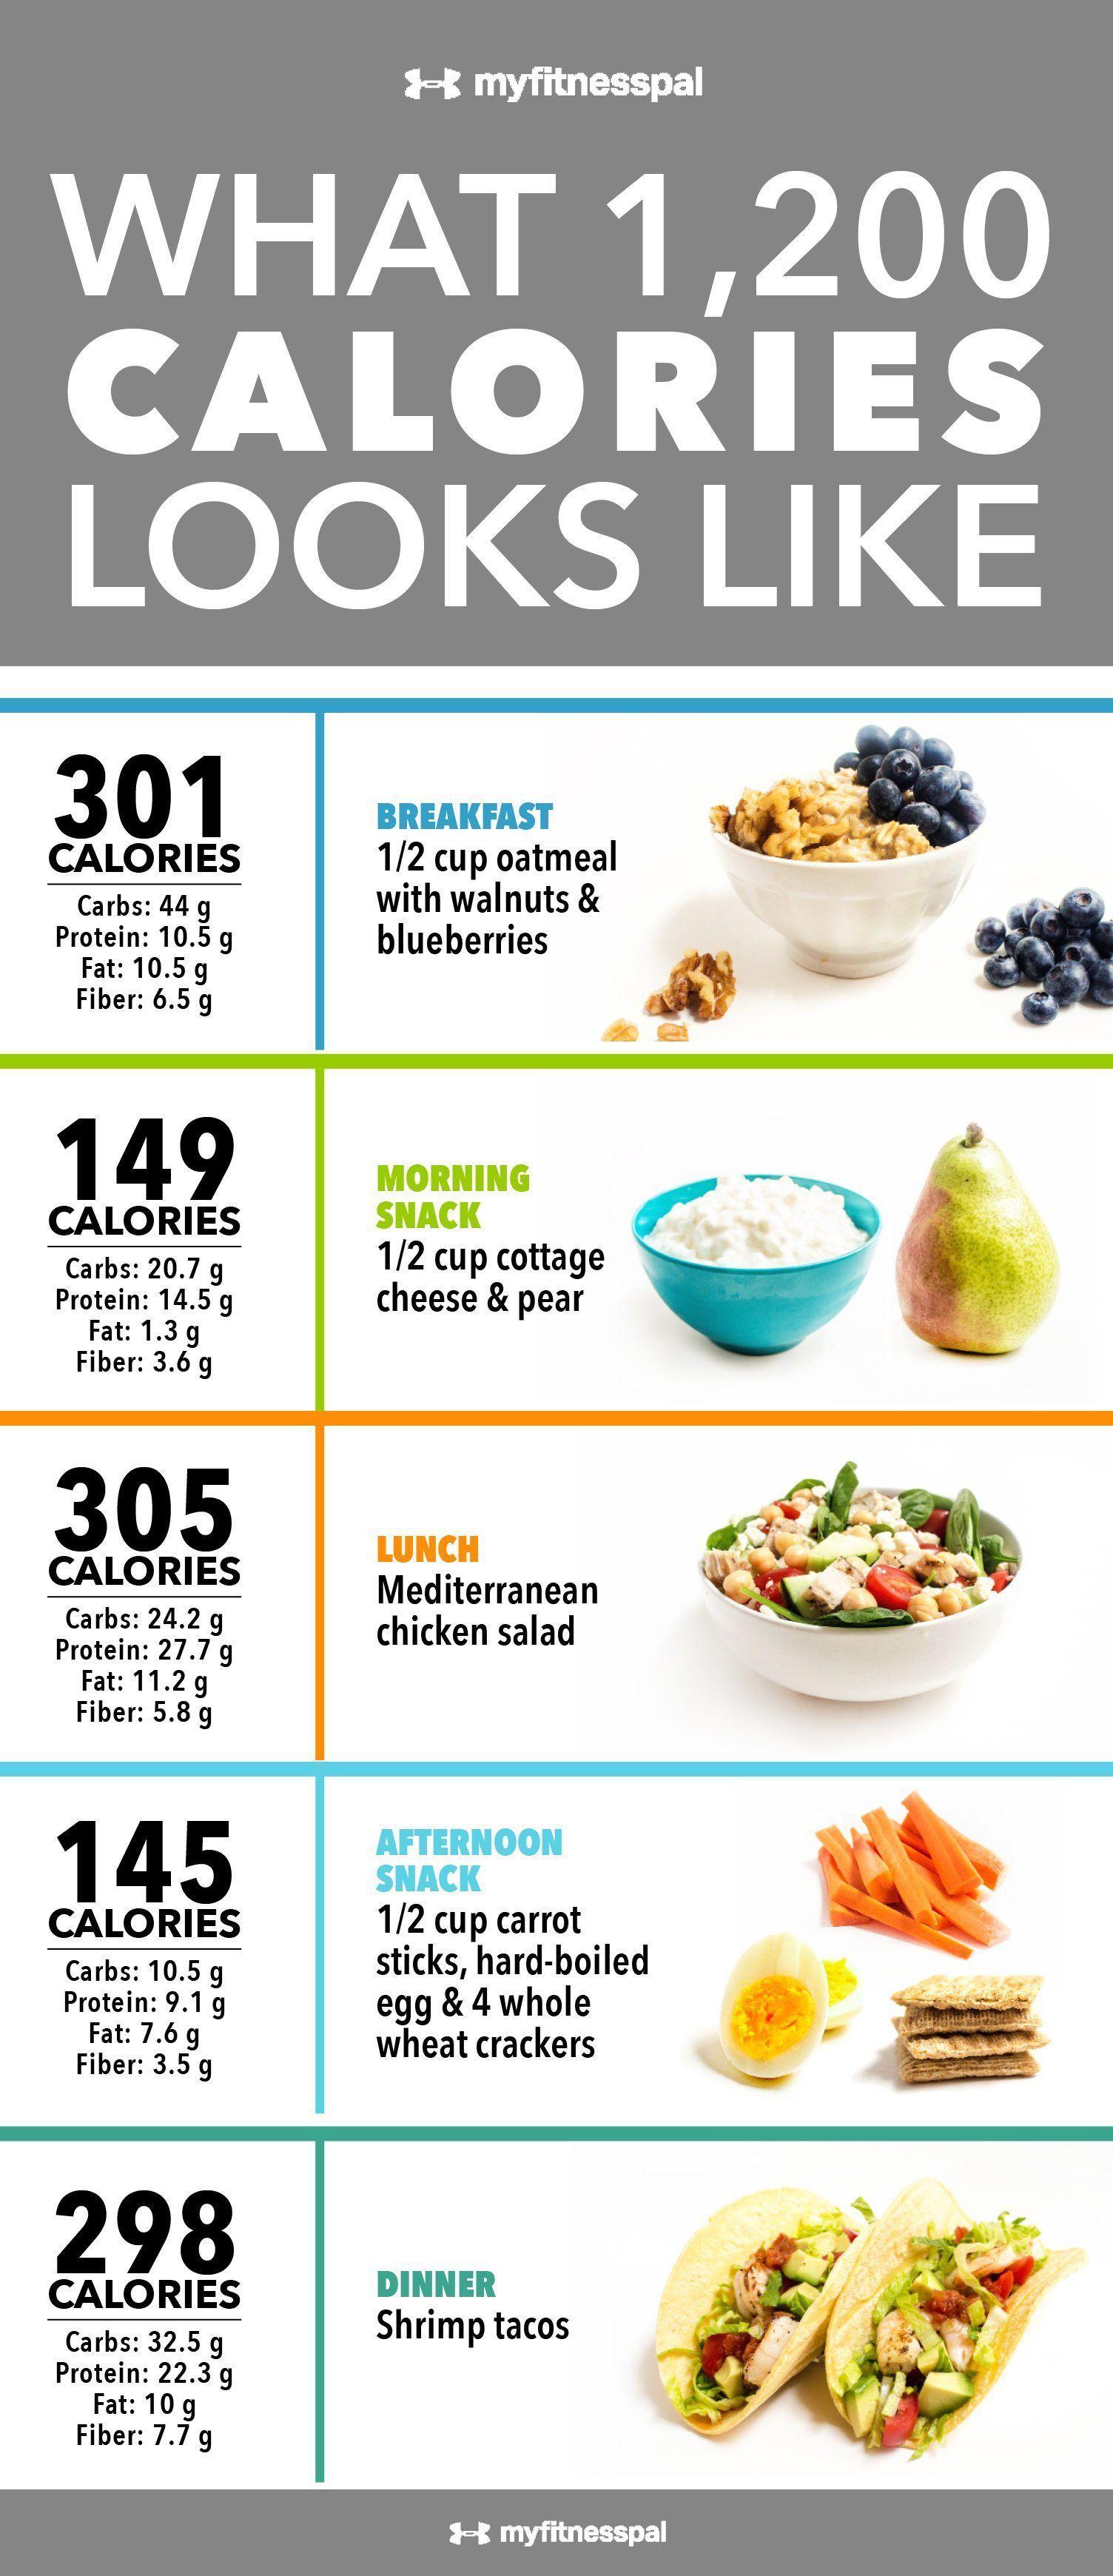 100 calorie per day diet plan